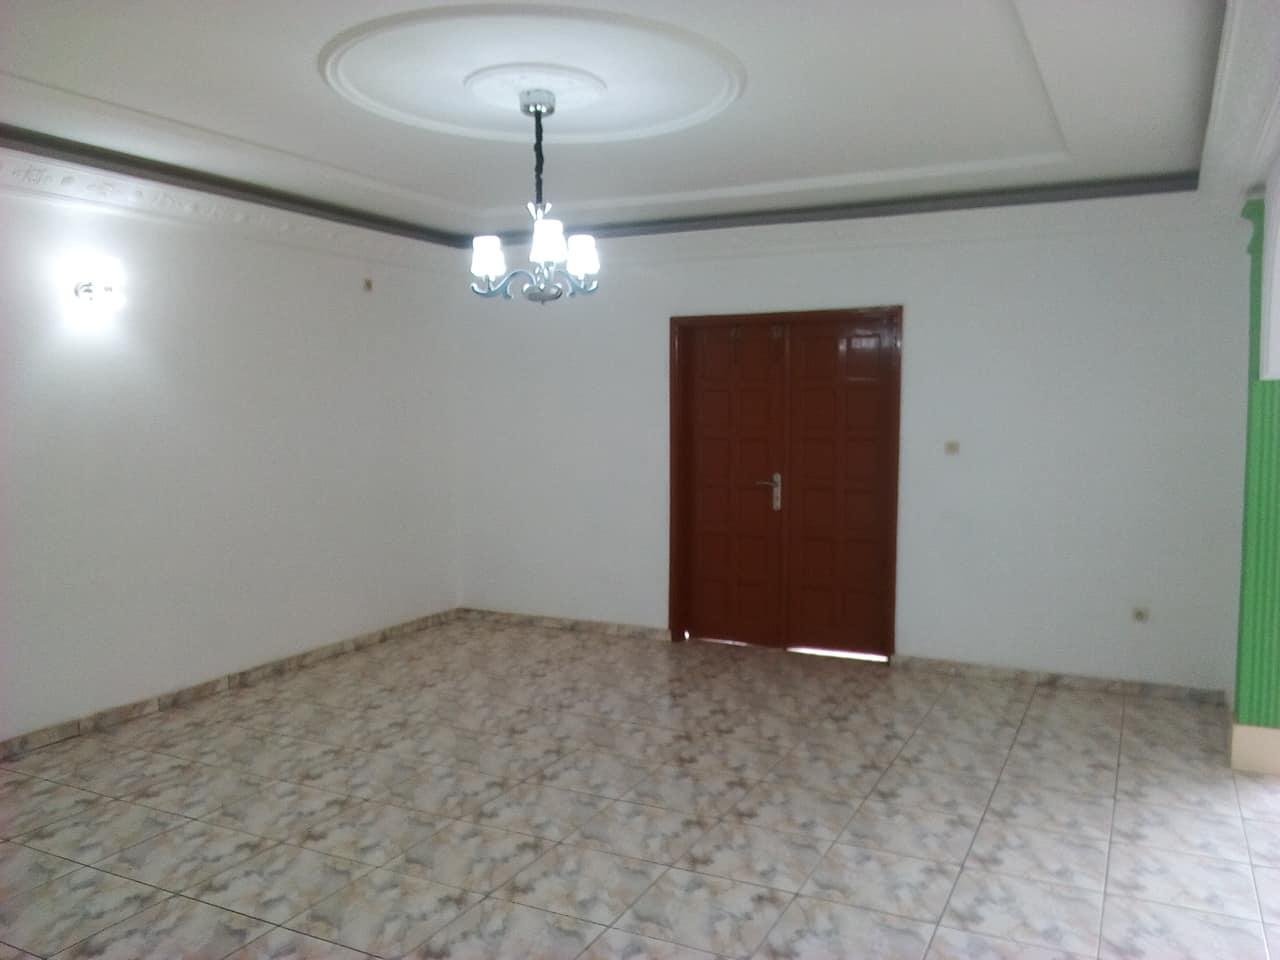 Apartment to rent - Yaoundé, Bastos, pas loin de mongobock - 1 living room(s), 3 bedroom(s), 3 bathroom(s) - 450 000 FCFA / month